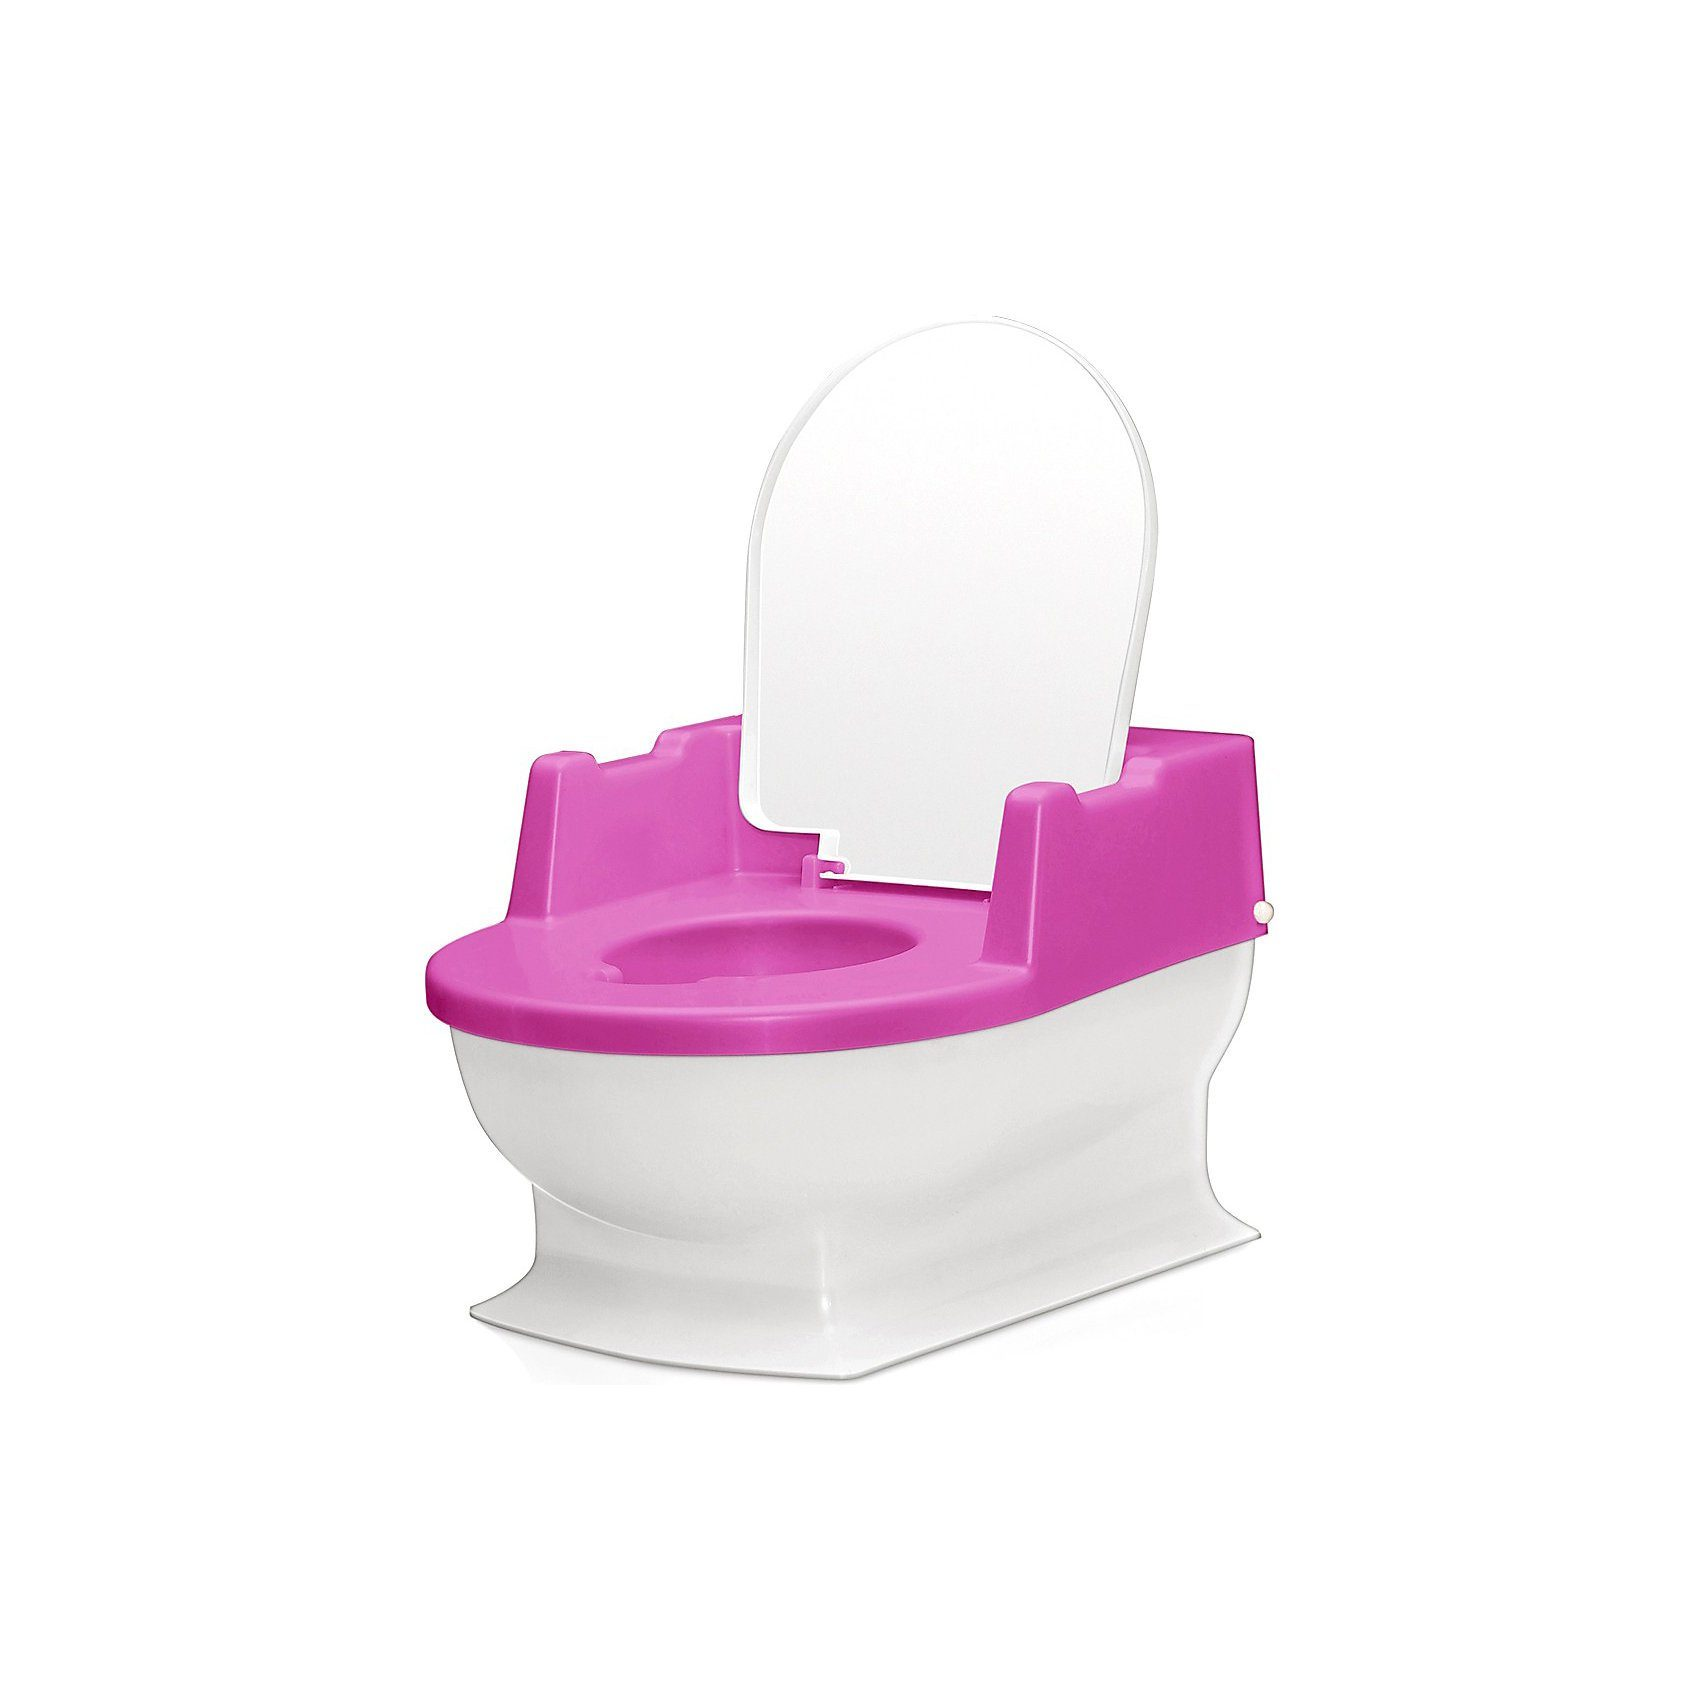 Reer Lerntöpfchen Sitzfritz, rosa